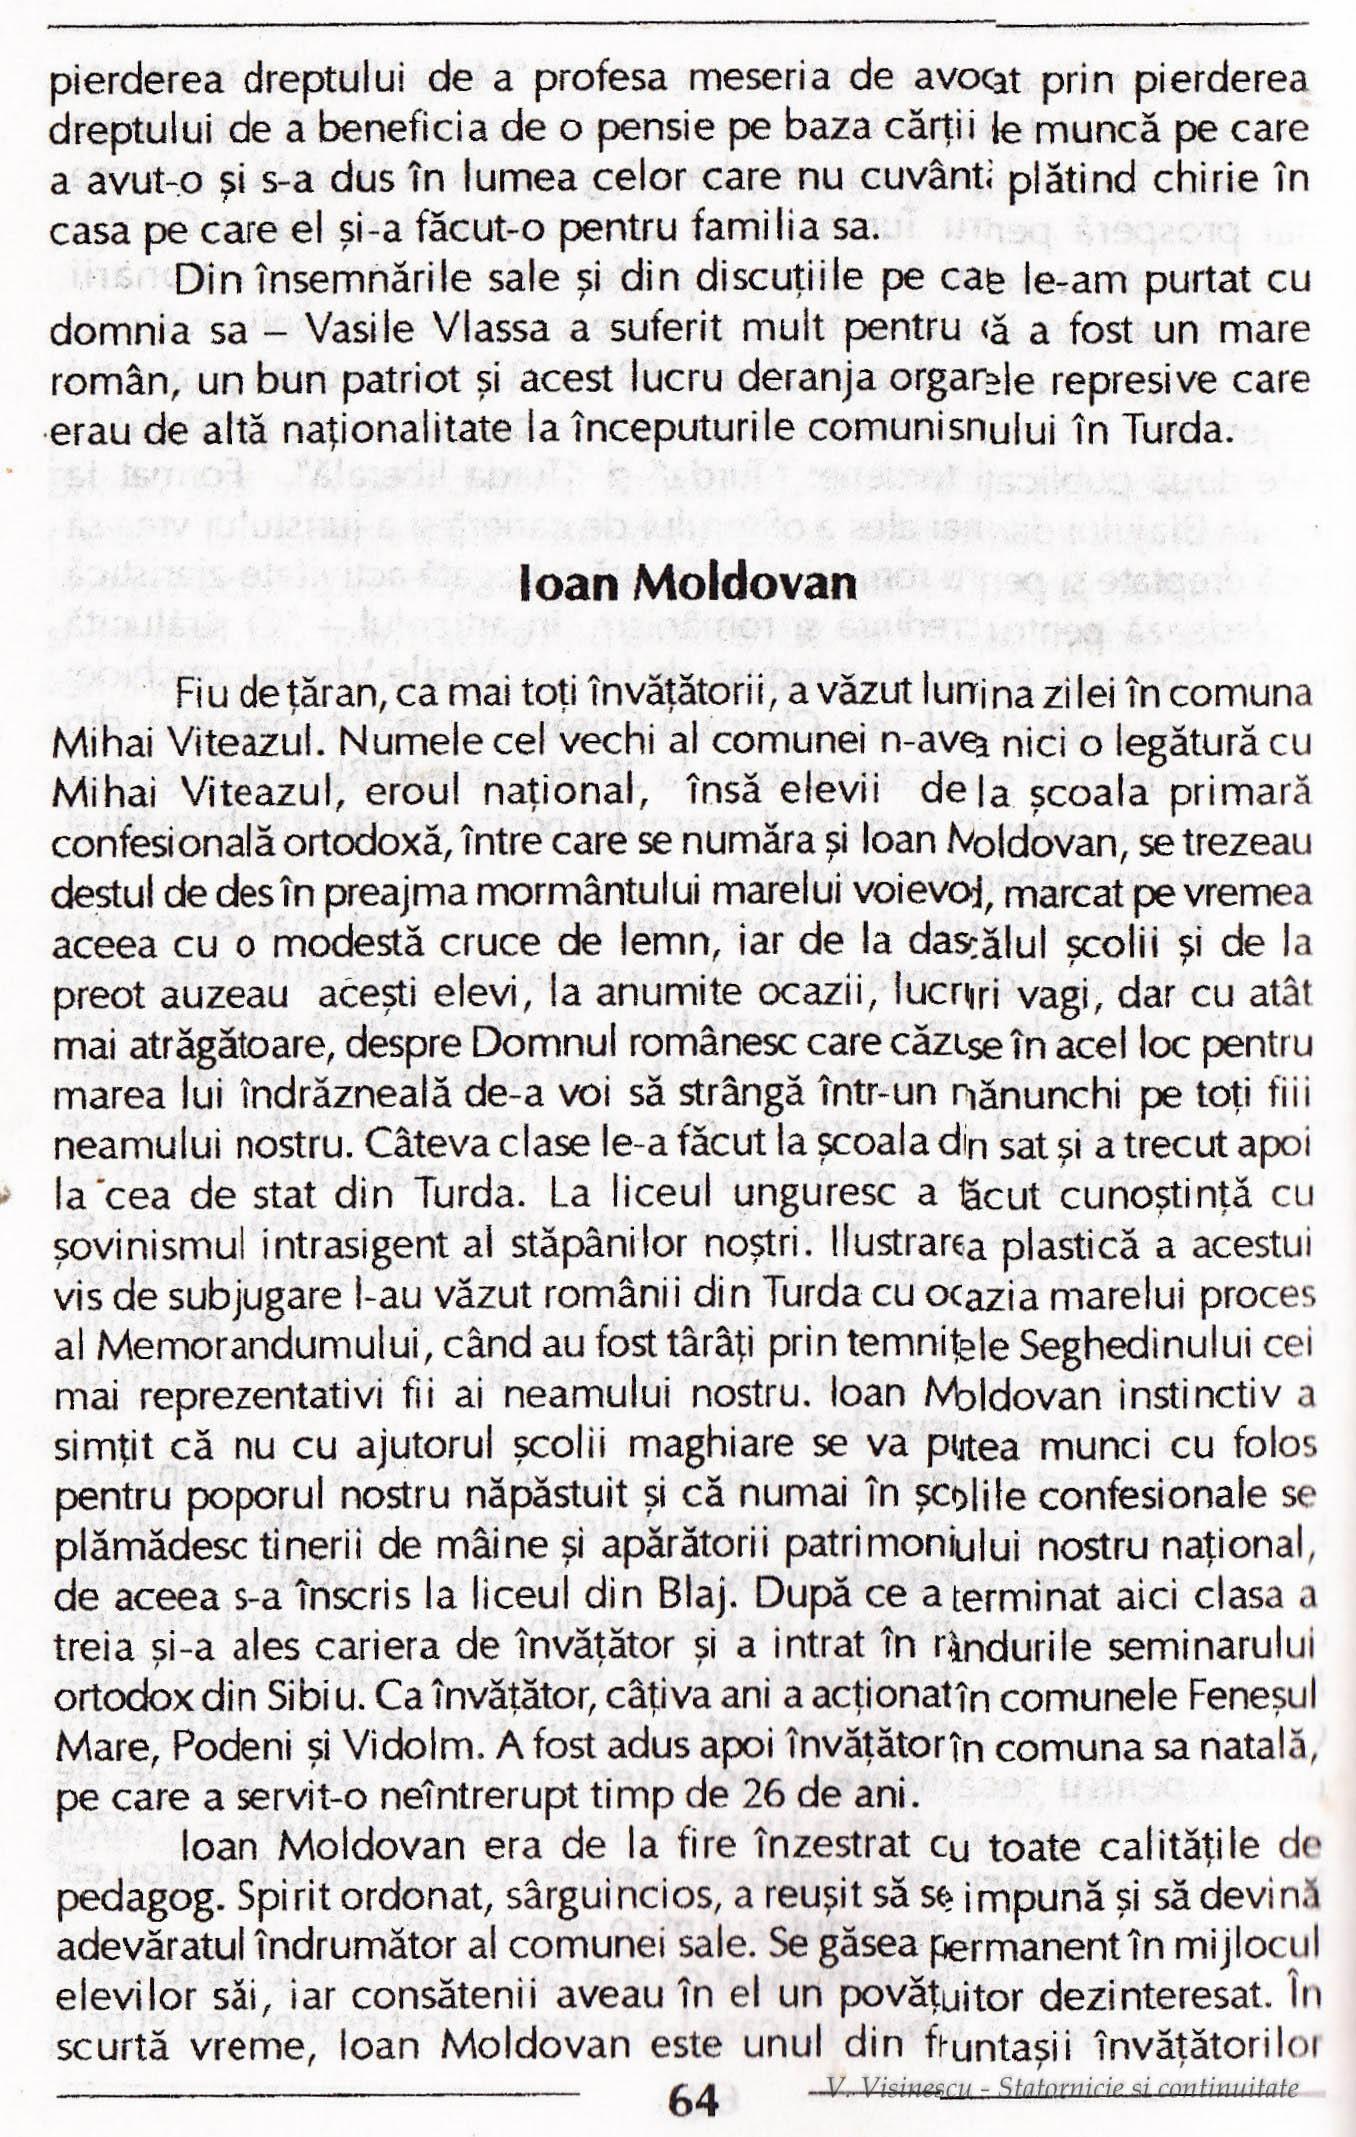 Photo: 64 - Ioan Moldovan.  Nascut in comun Mihai Viteazul. Alege cariera de invatator. A intrat in randurile  seminarului ortodox din Sibiu.